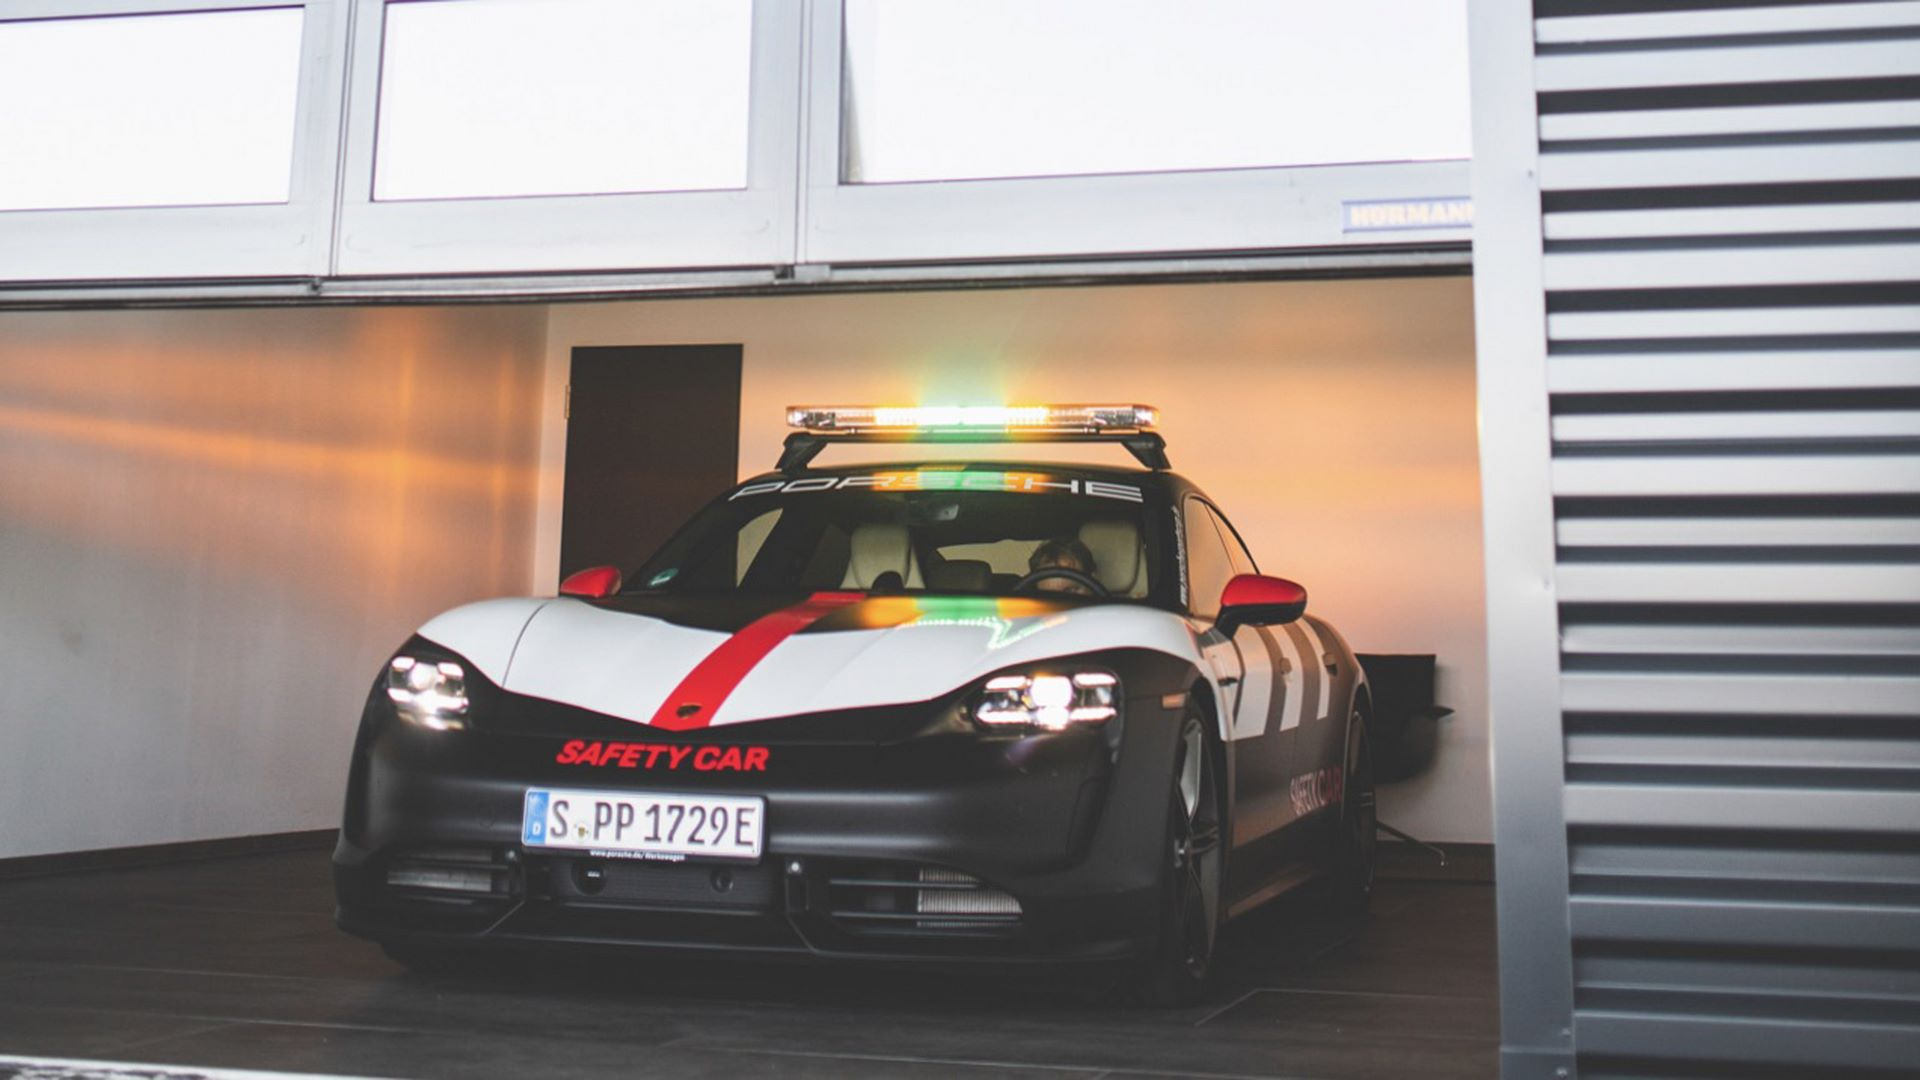 Porsche-Taycan-Turbo-safety-car-Le-Mans-2020-18